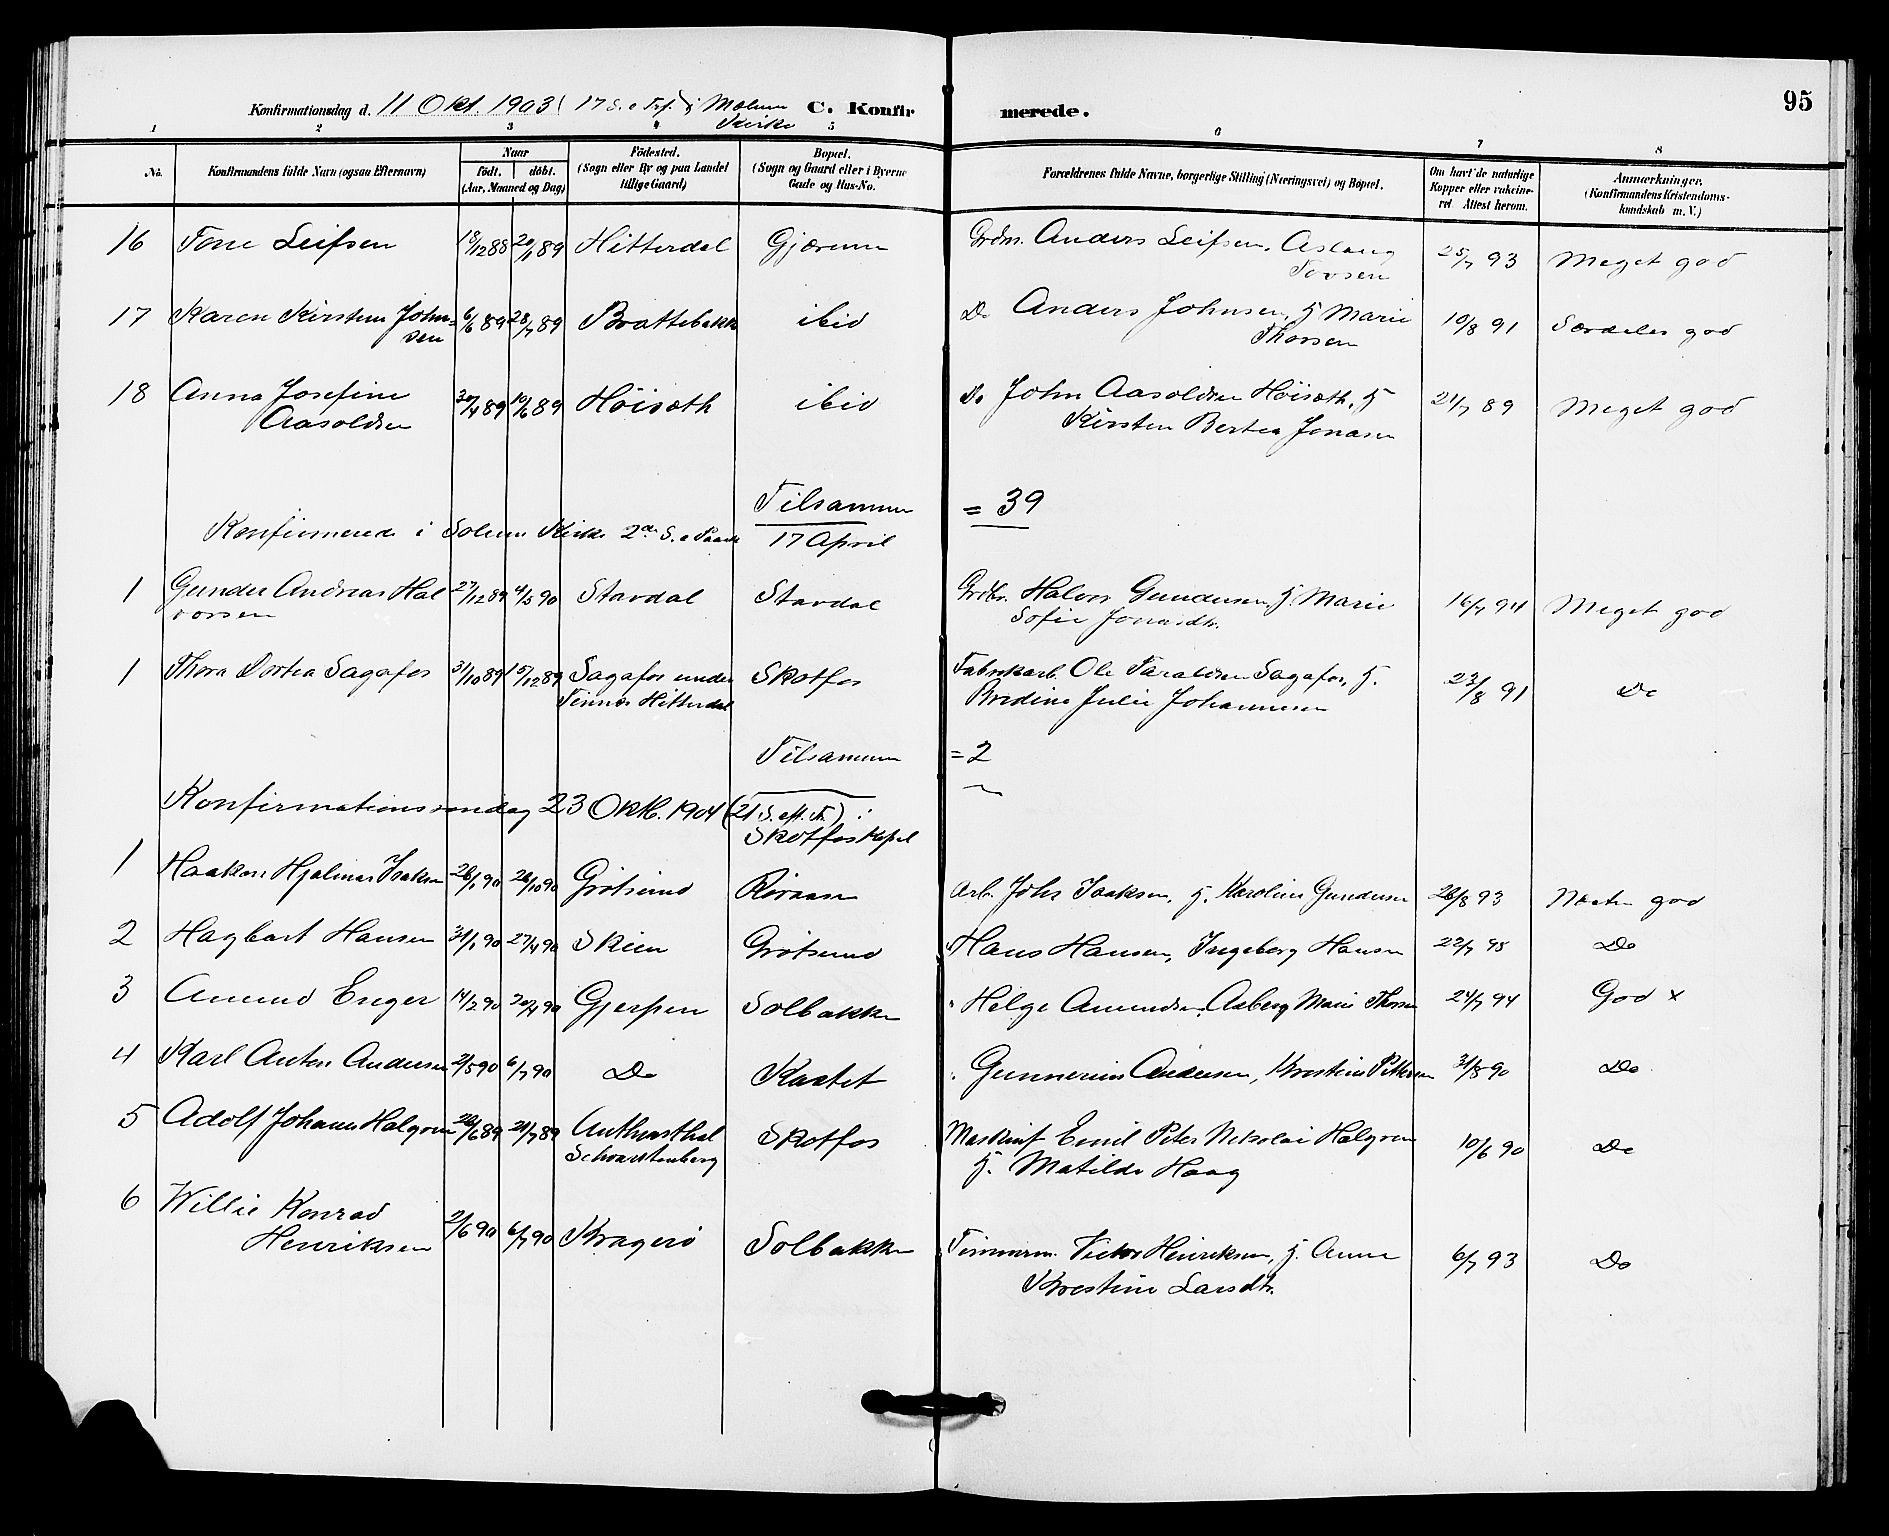 SAKO, Solum kirkebøker, G/Gb/L0004: Klokkerbok nr. II 4, 1898-1905, s. 95